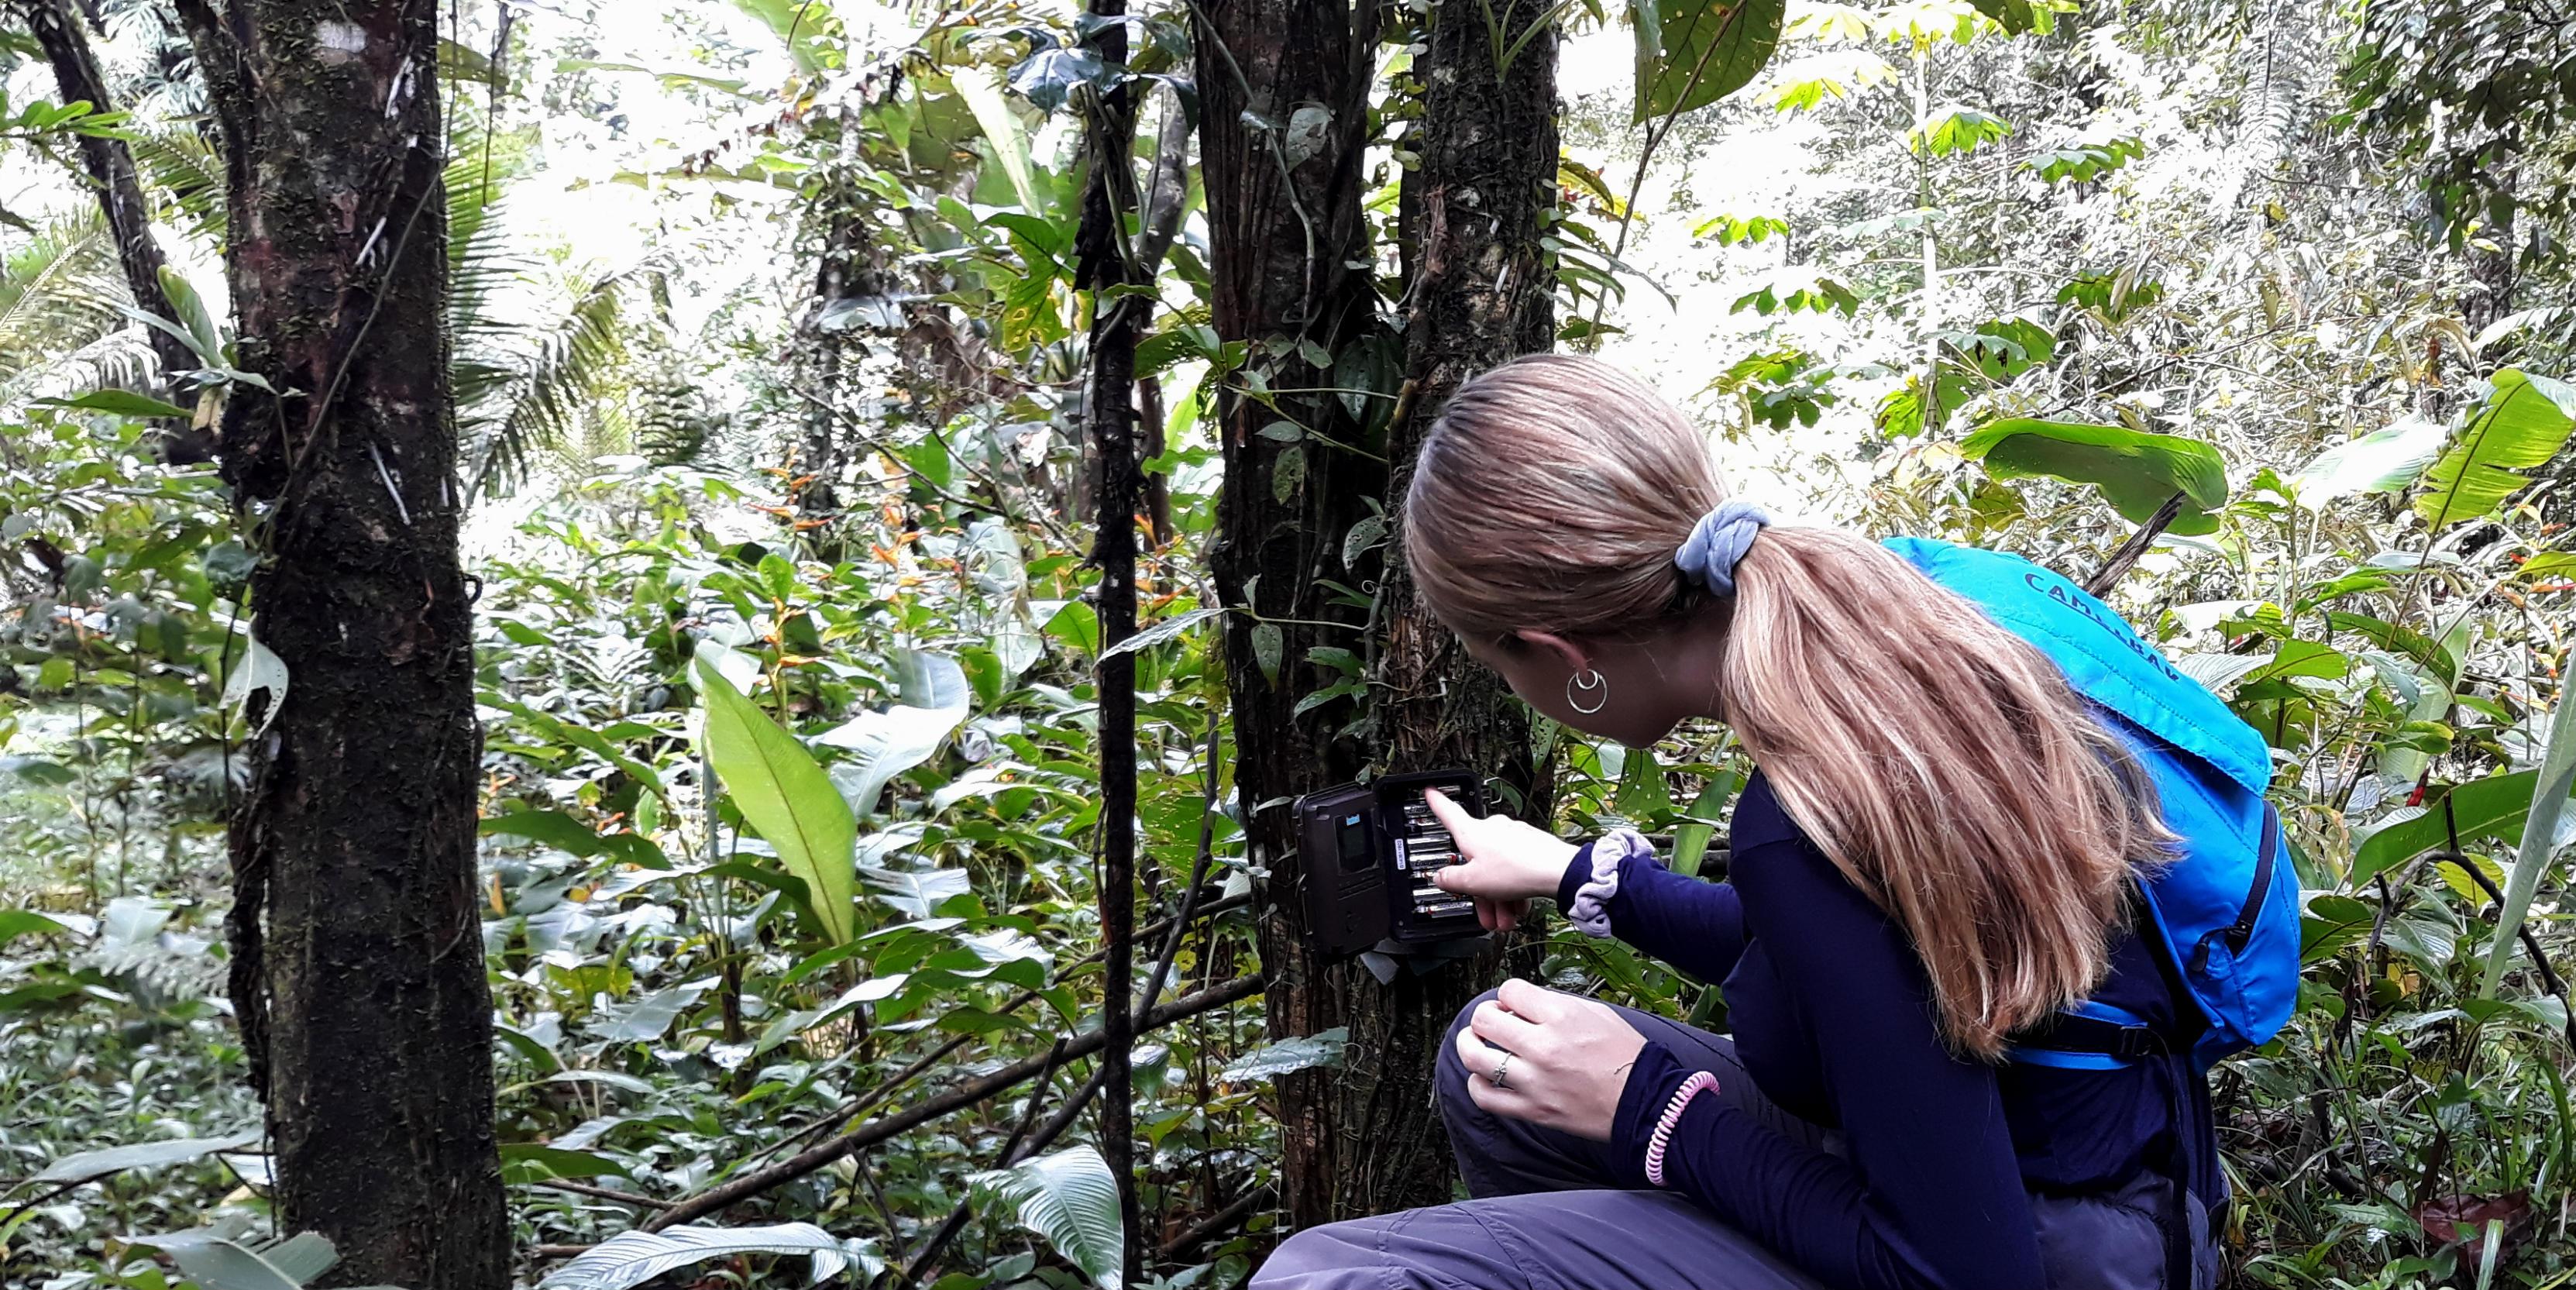 Volunteer with wildlife